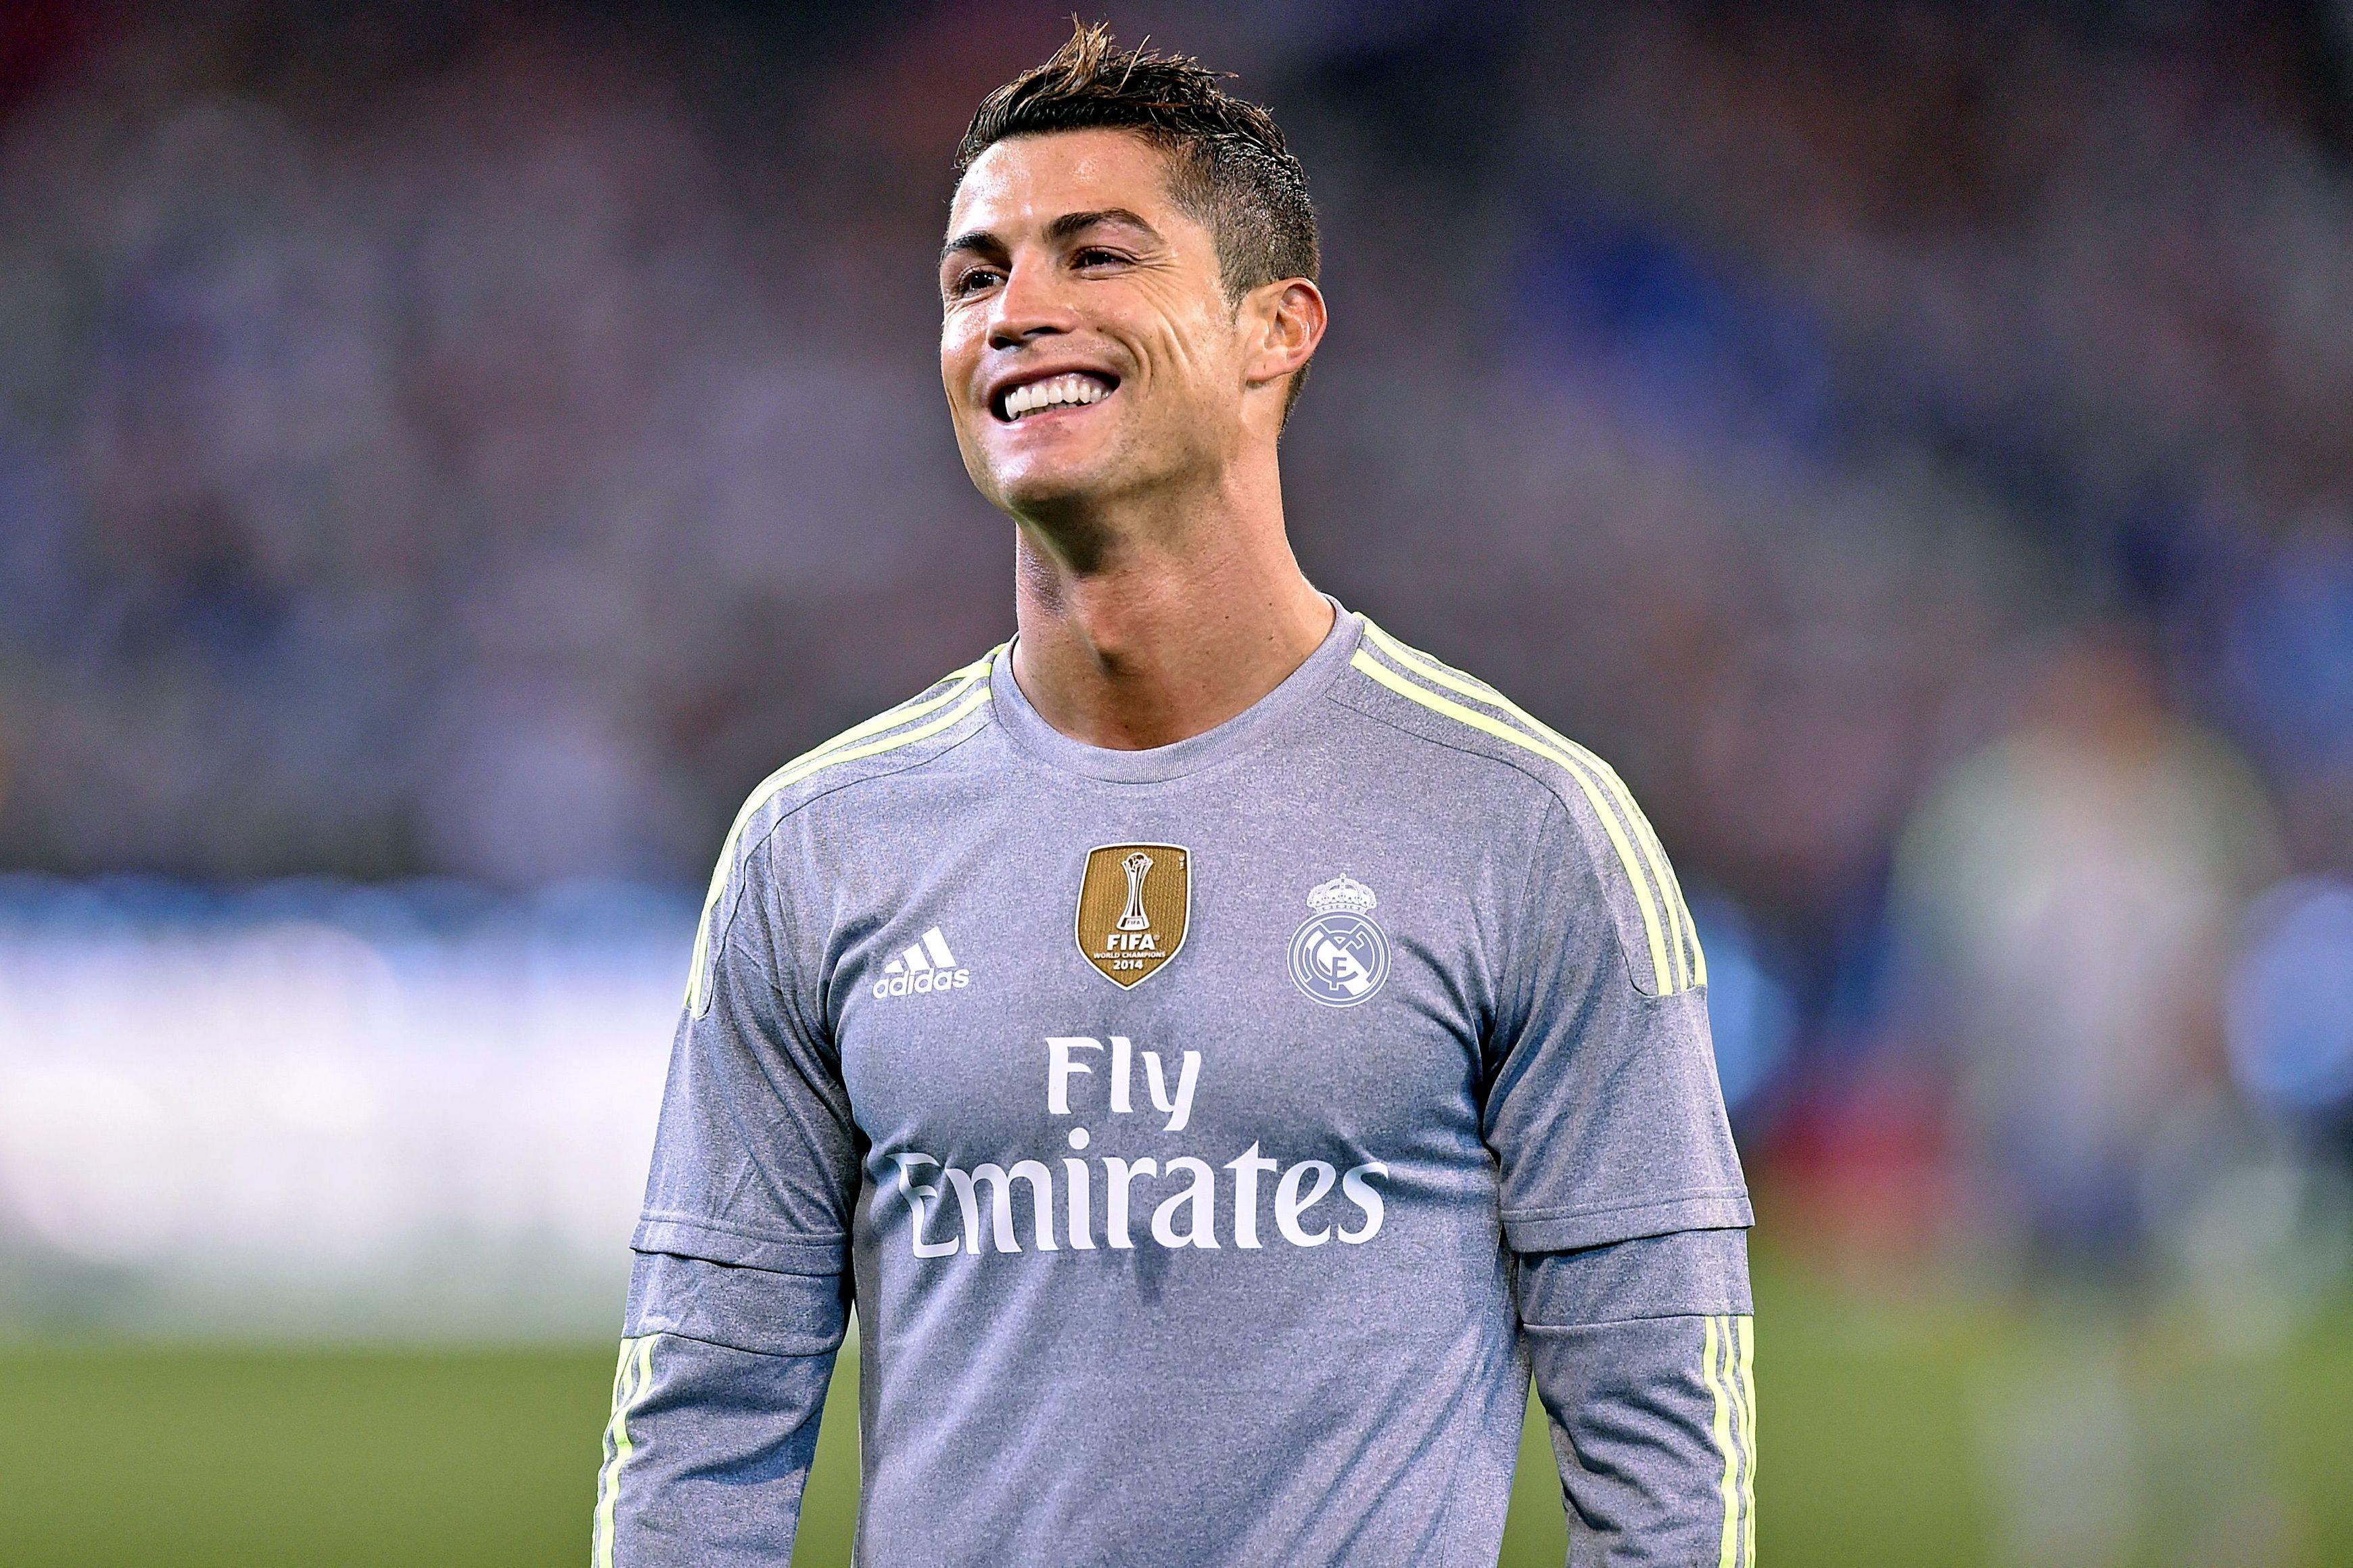 Cristiano Ronaldo HD wallpapers free download